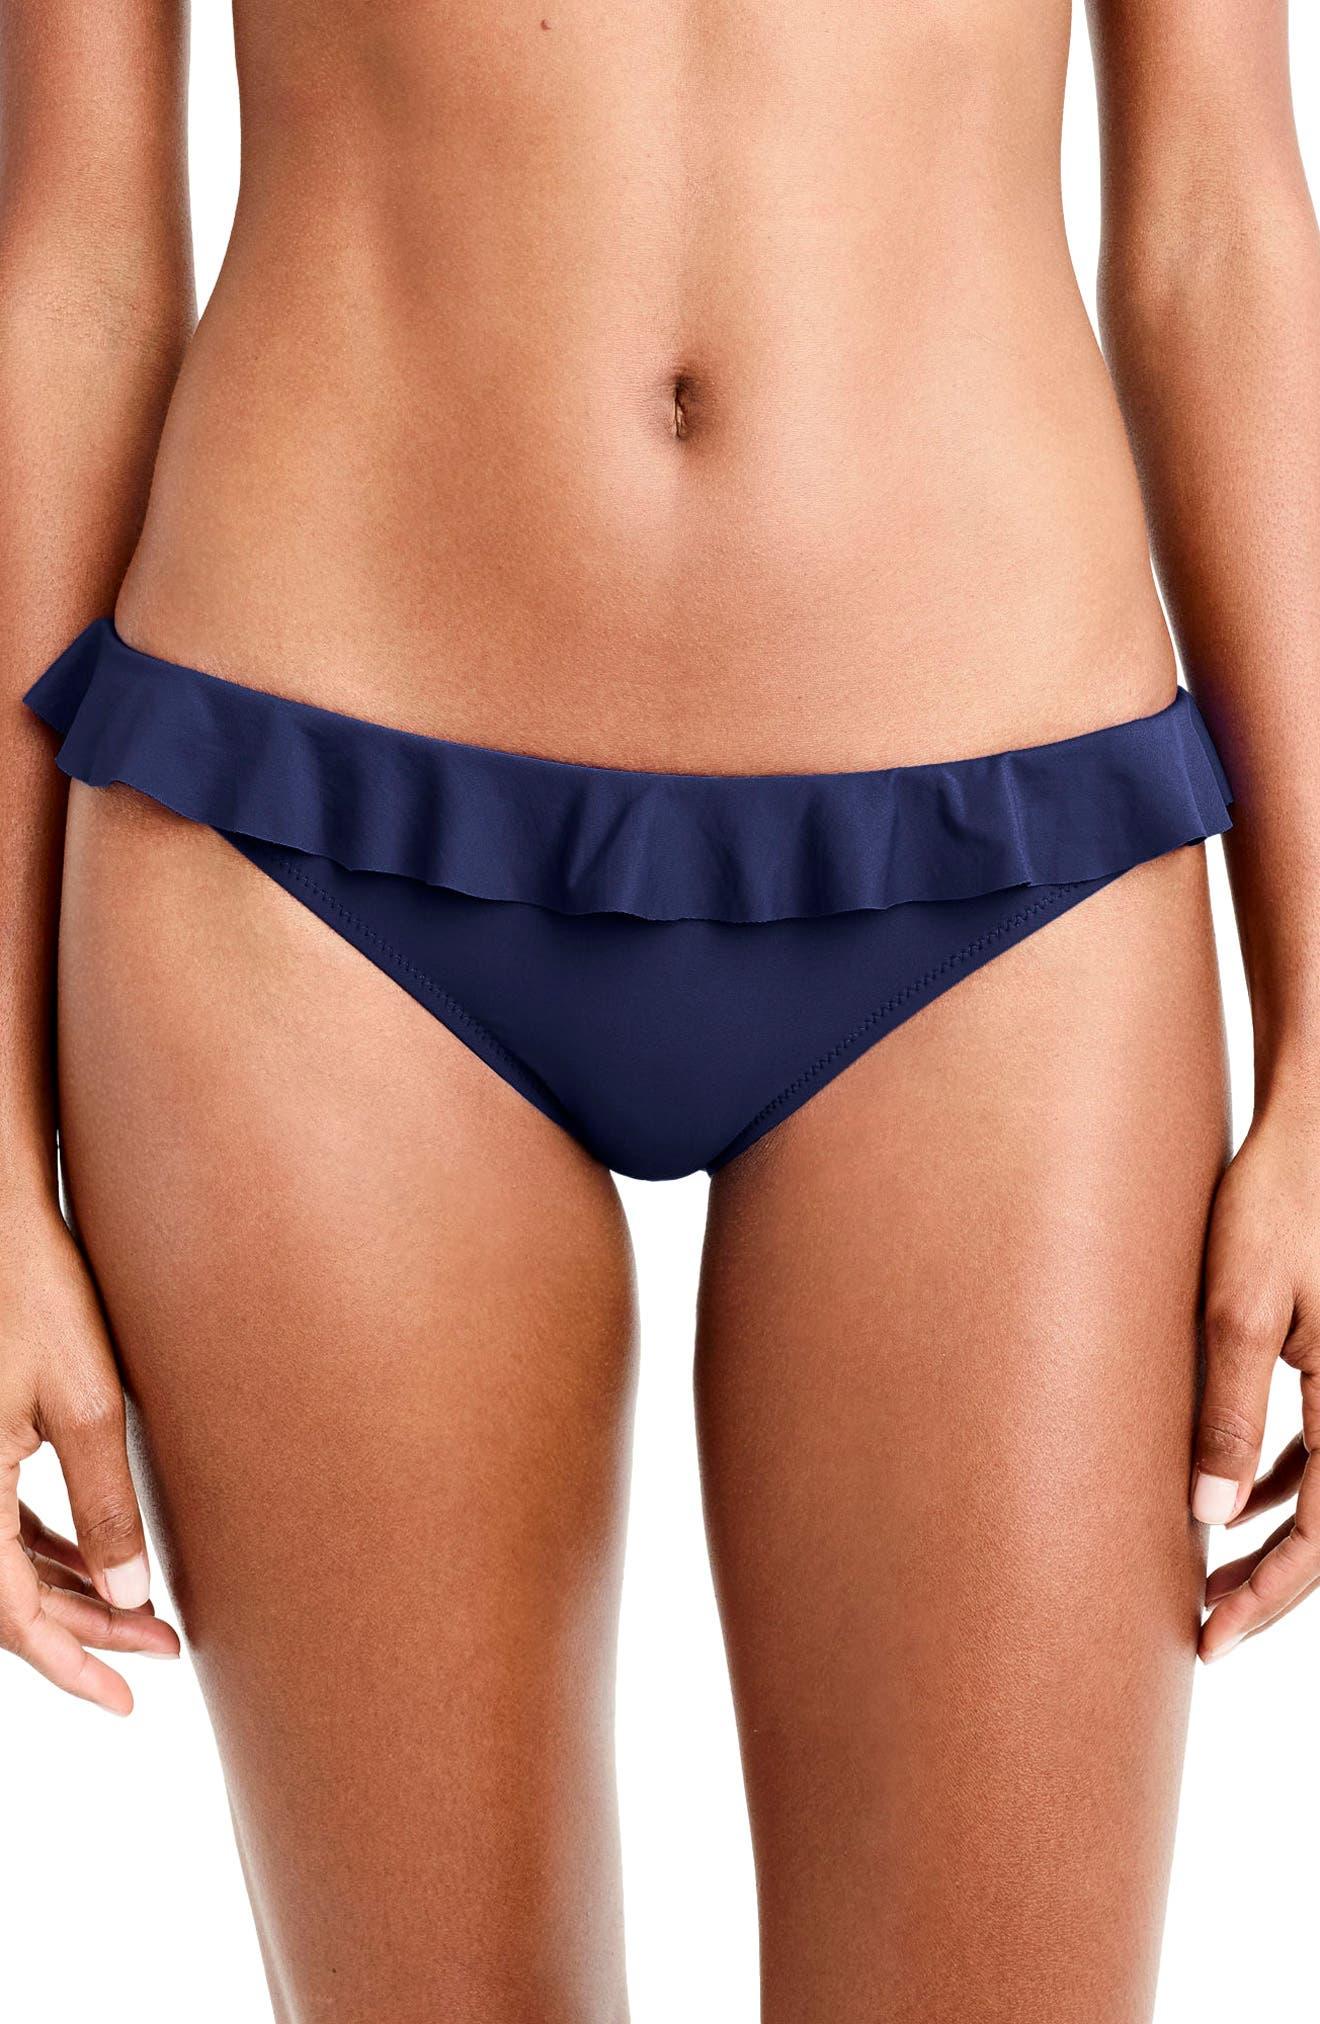 Alternate Image 1 Selected - J.Crew Ruffle Bikini Bottom